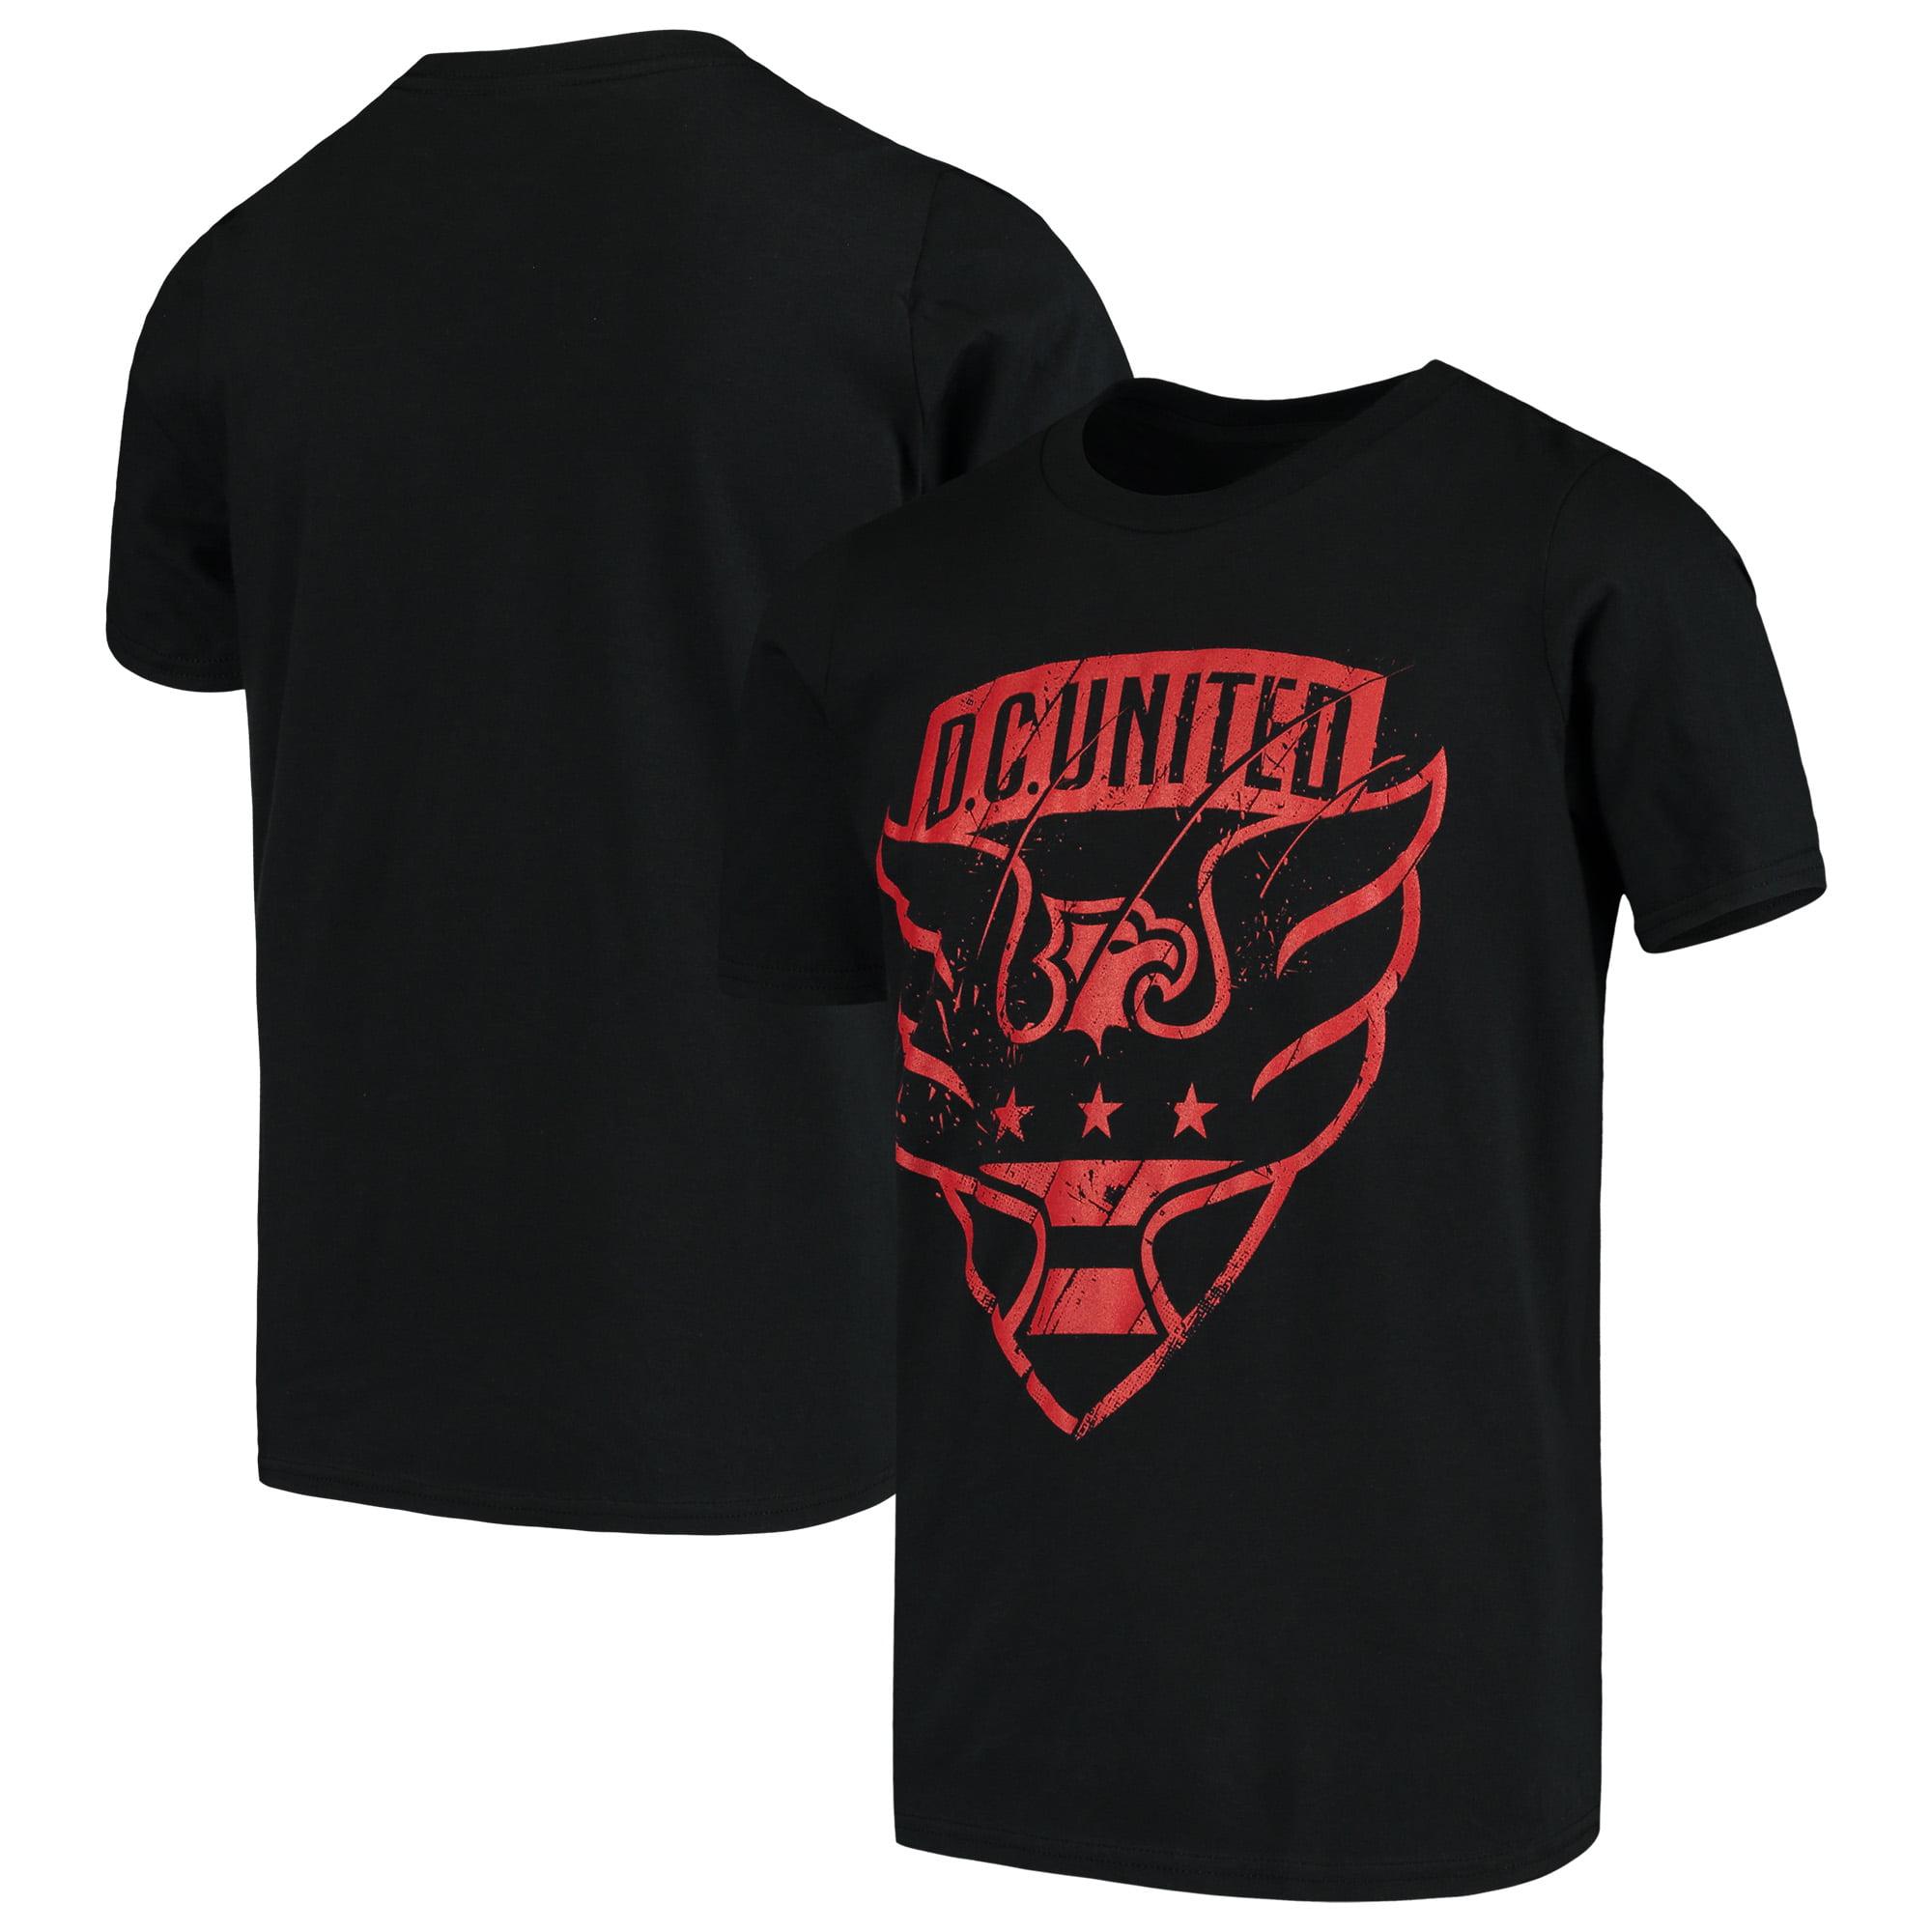 D.C. United Youth Rush to Score T-Shirt - Black